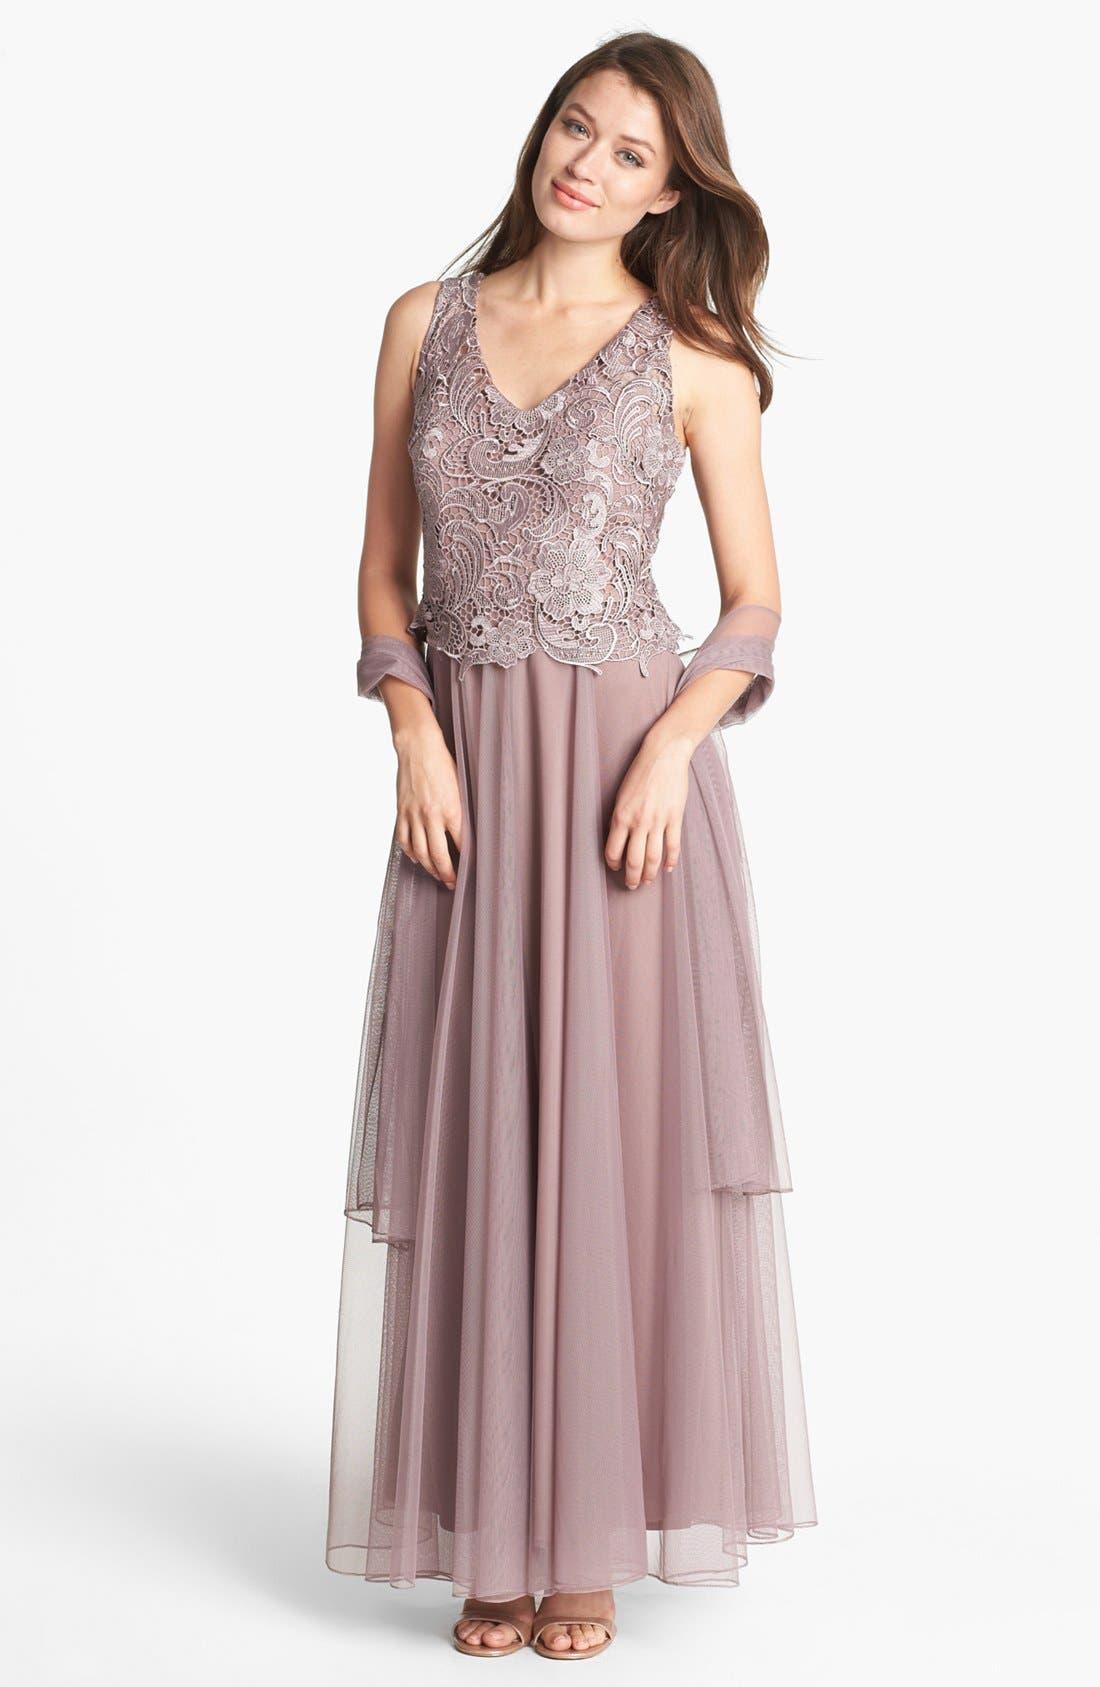 Alternate Image 1 Selected - Patra Venice Lace & Chiffon Dress (Regular & Petite)